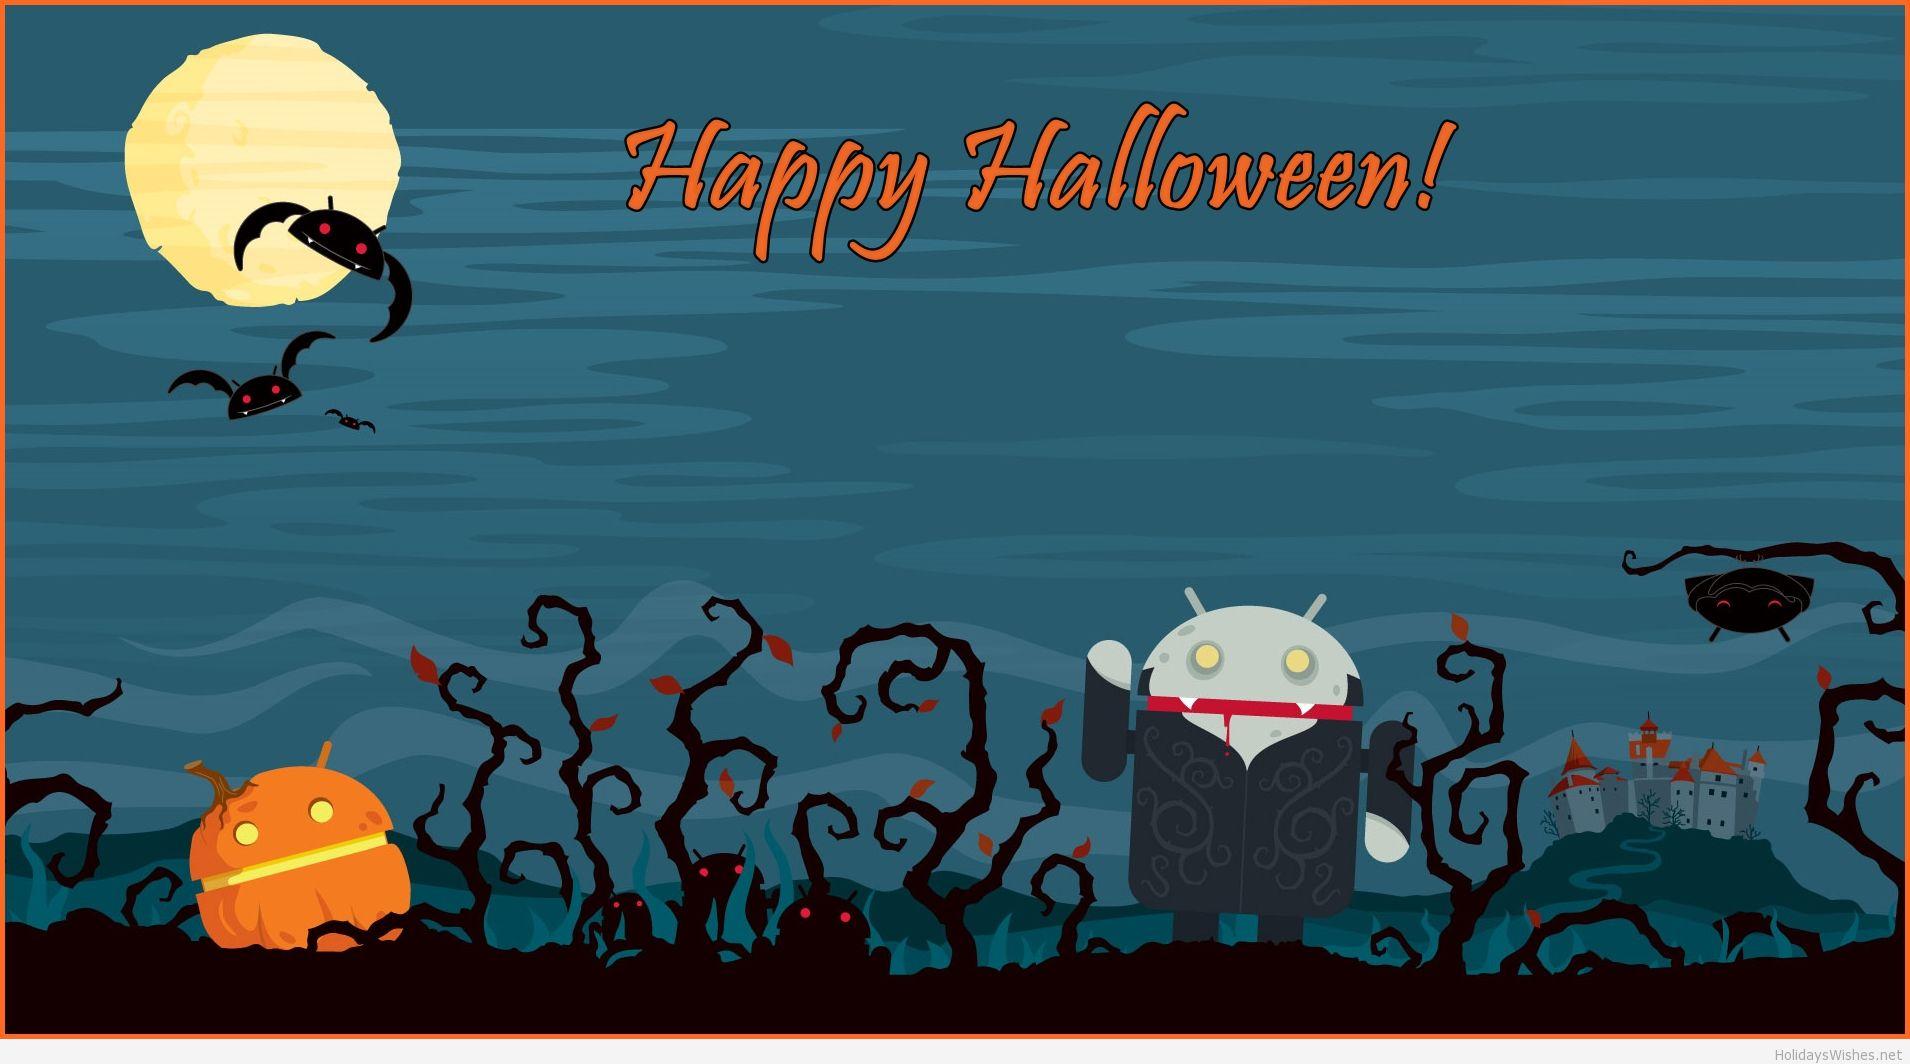 Happy-Halloween-scary-image